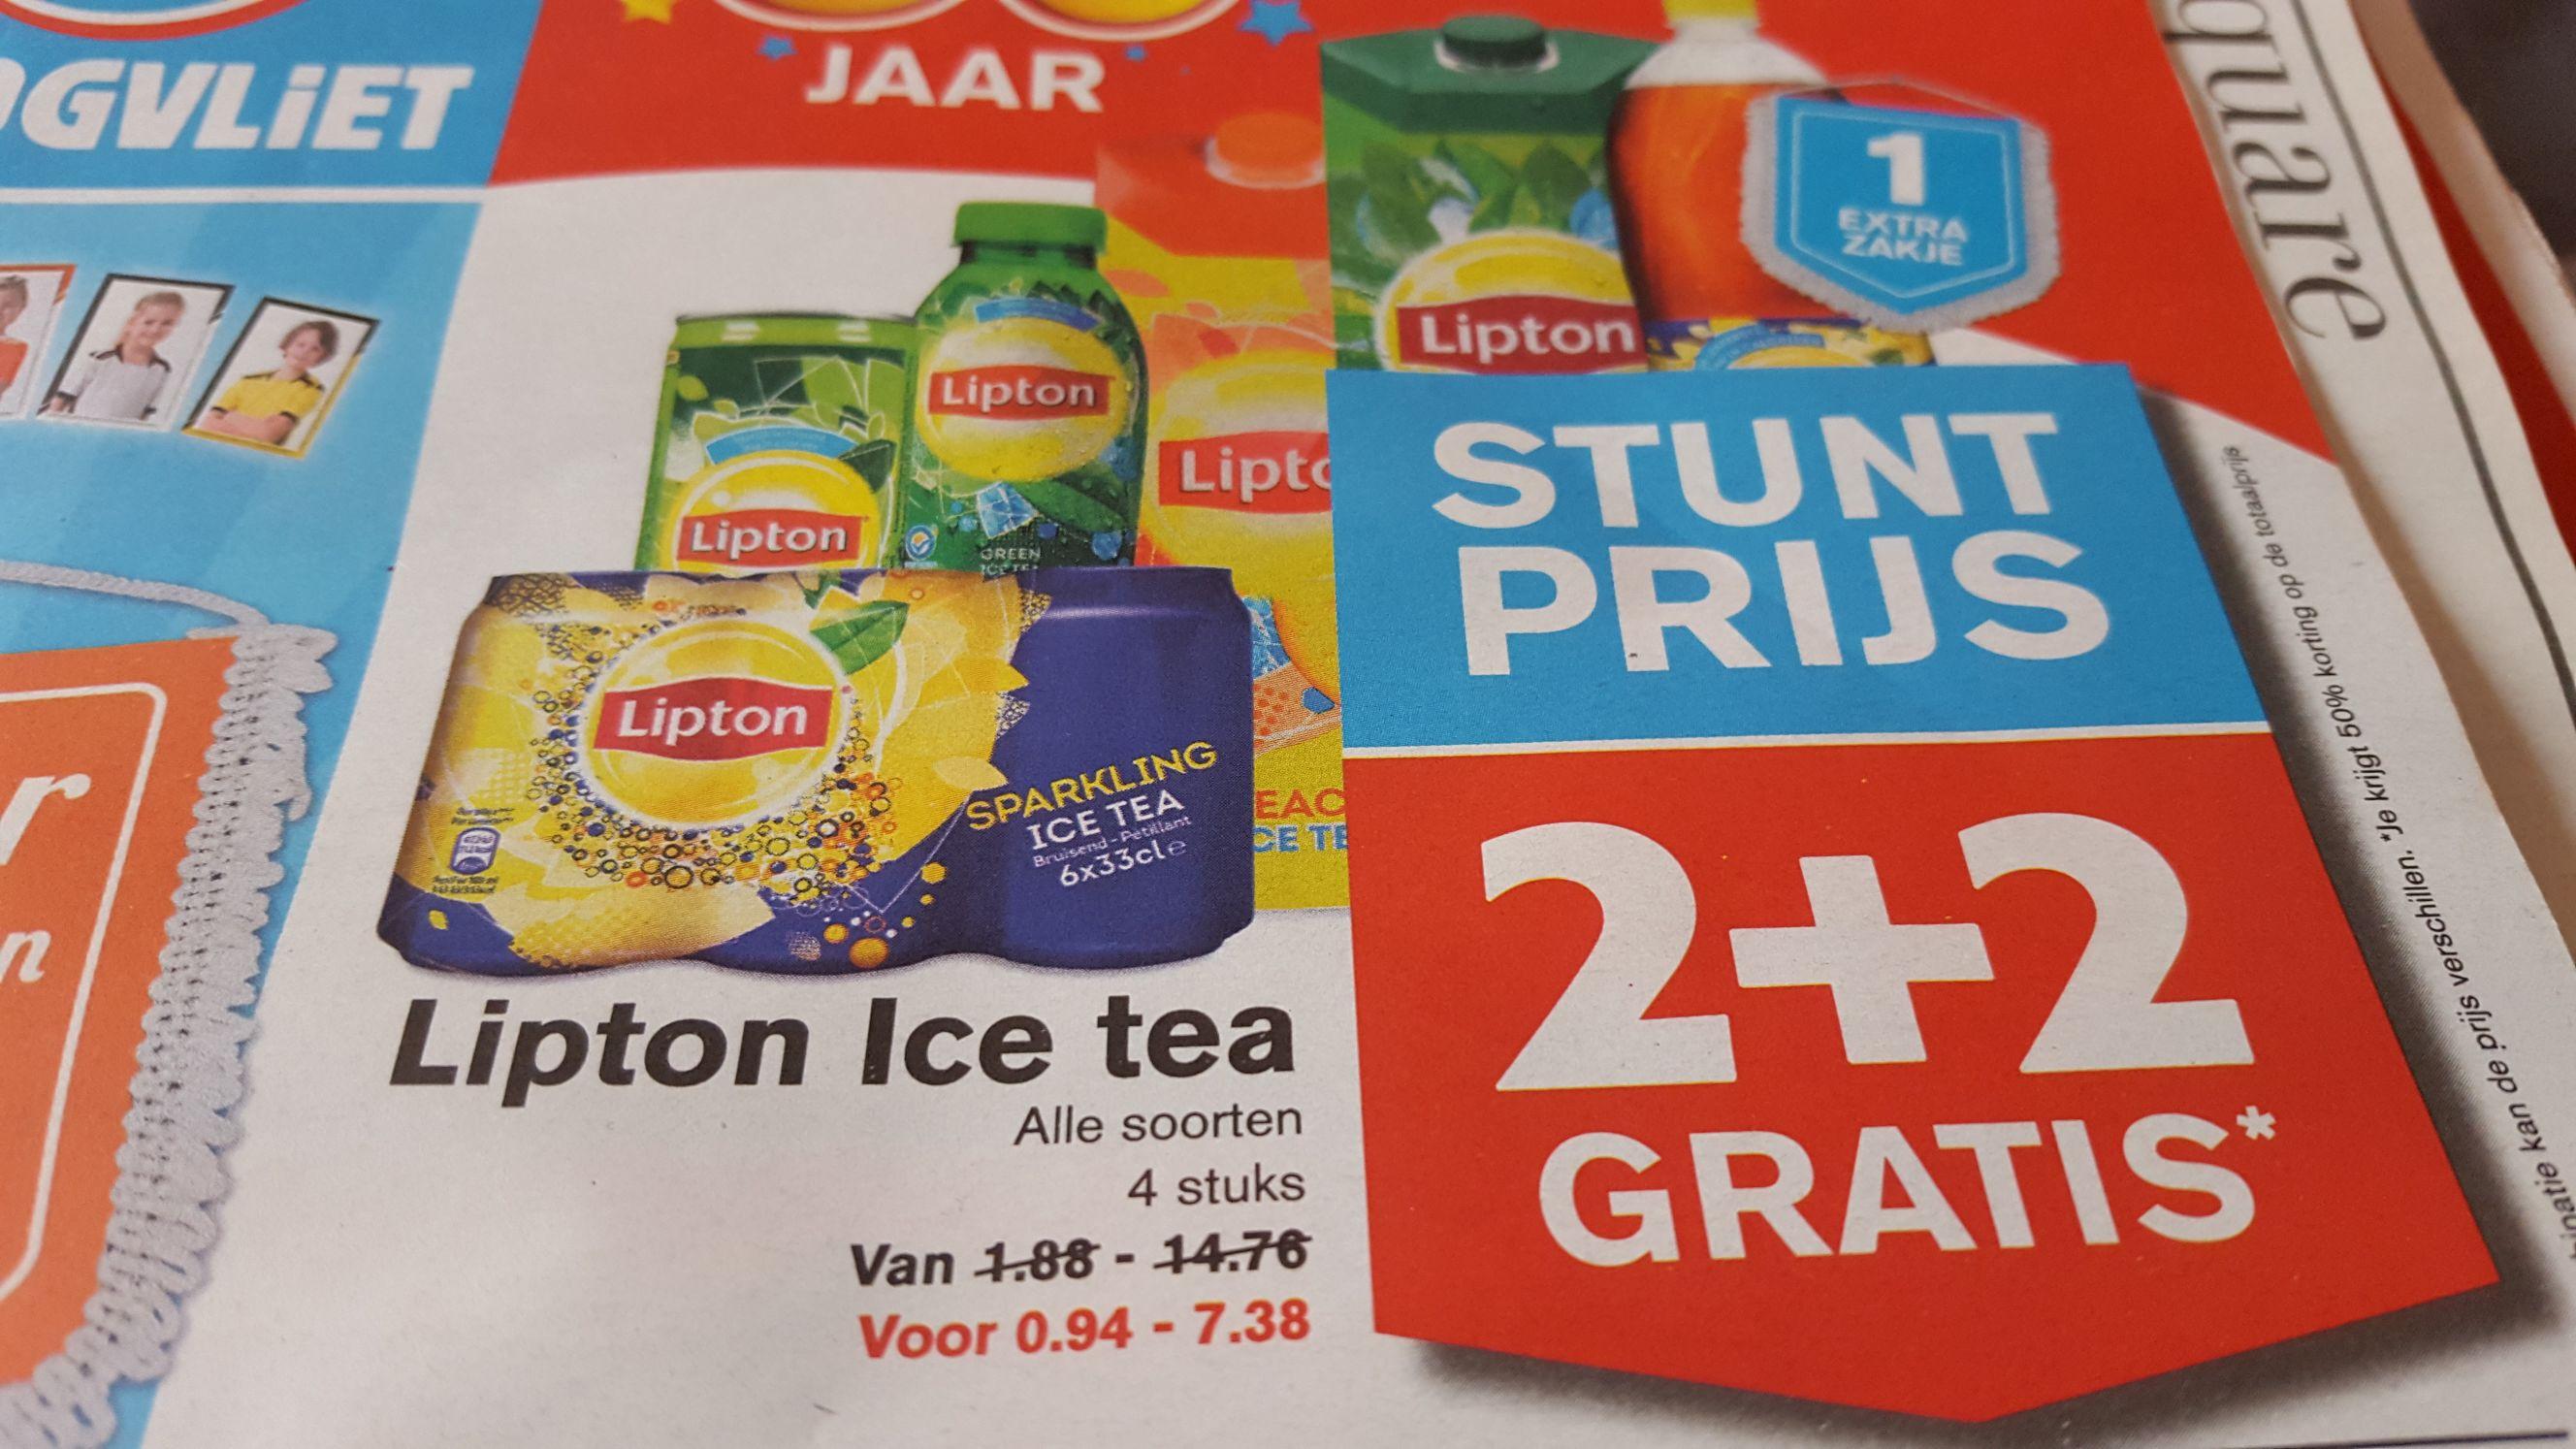 Lipton Ice Tea 2+2 gratis Hoogvliet!